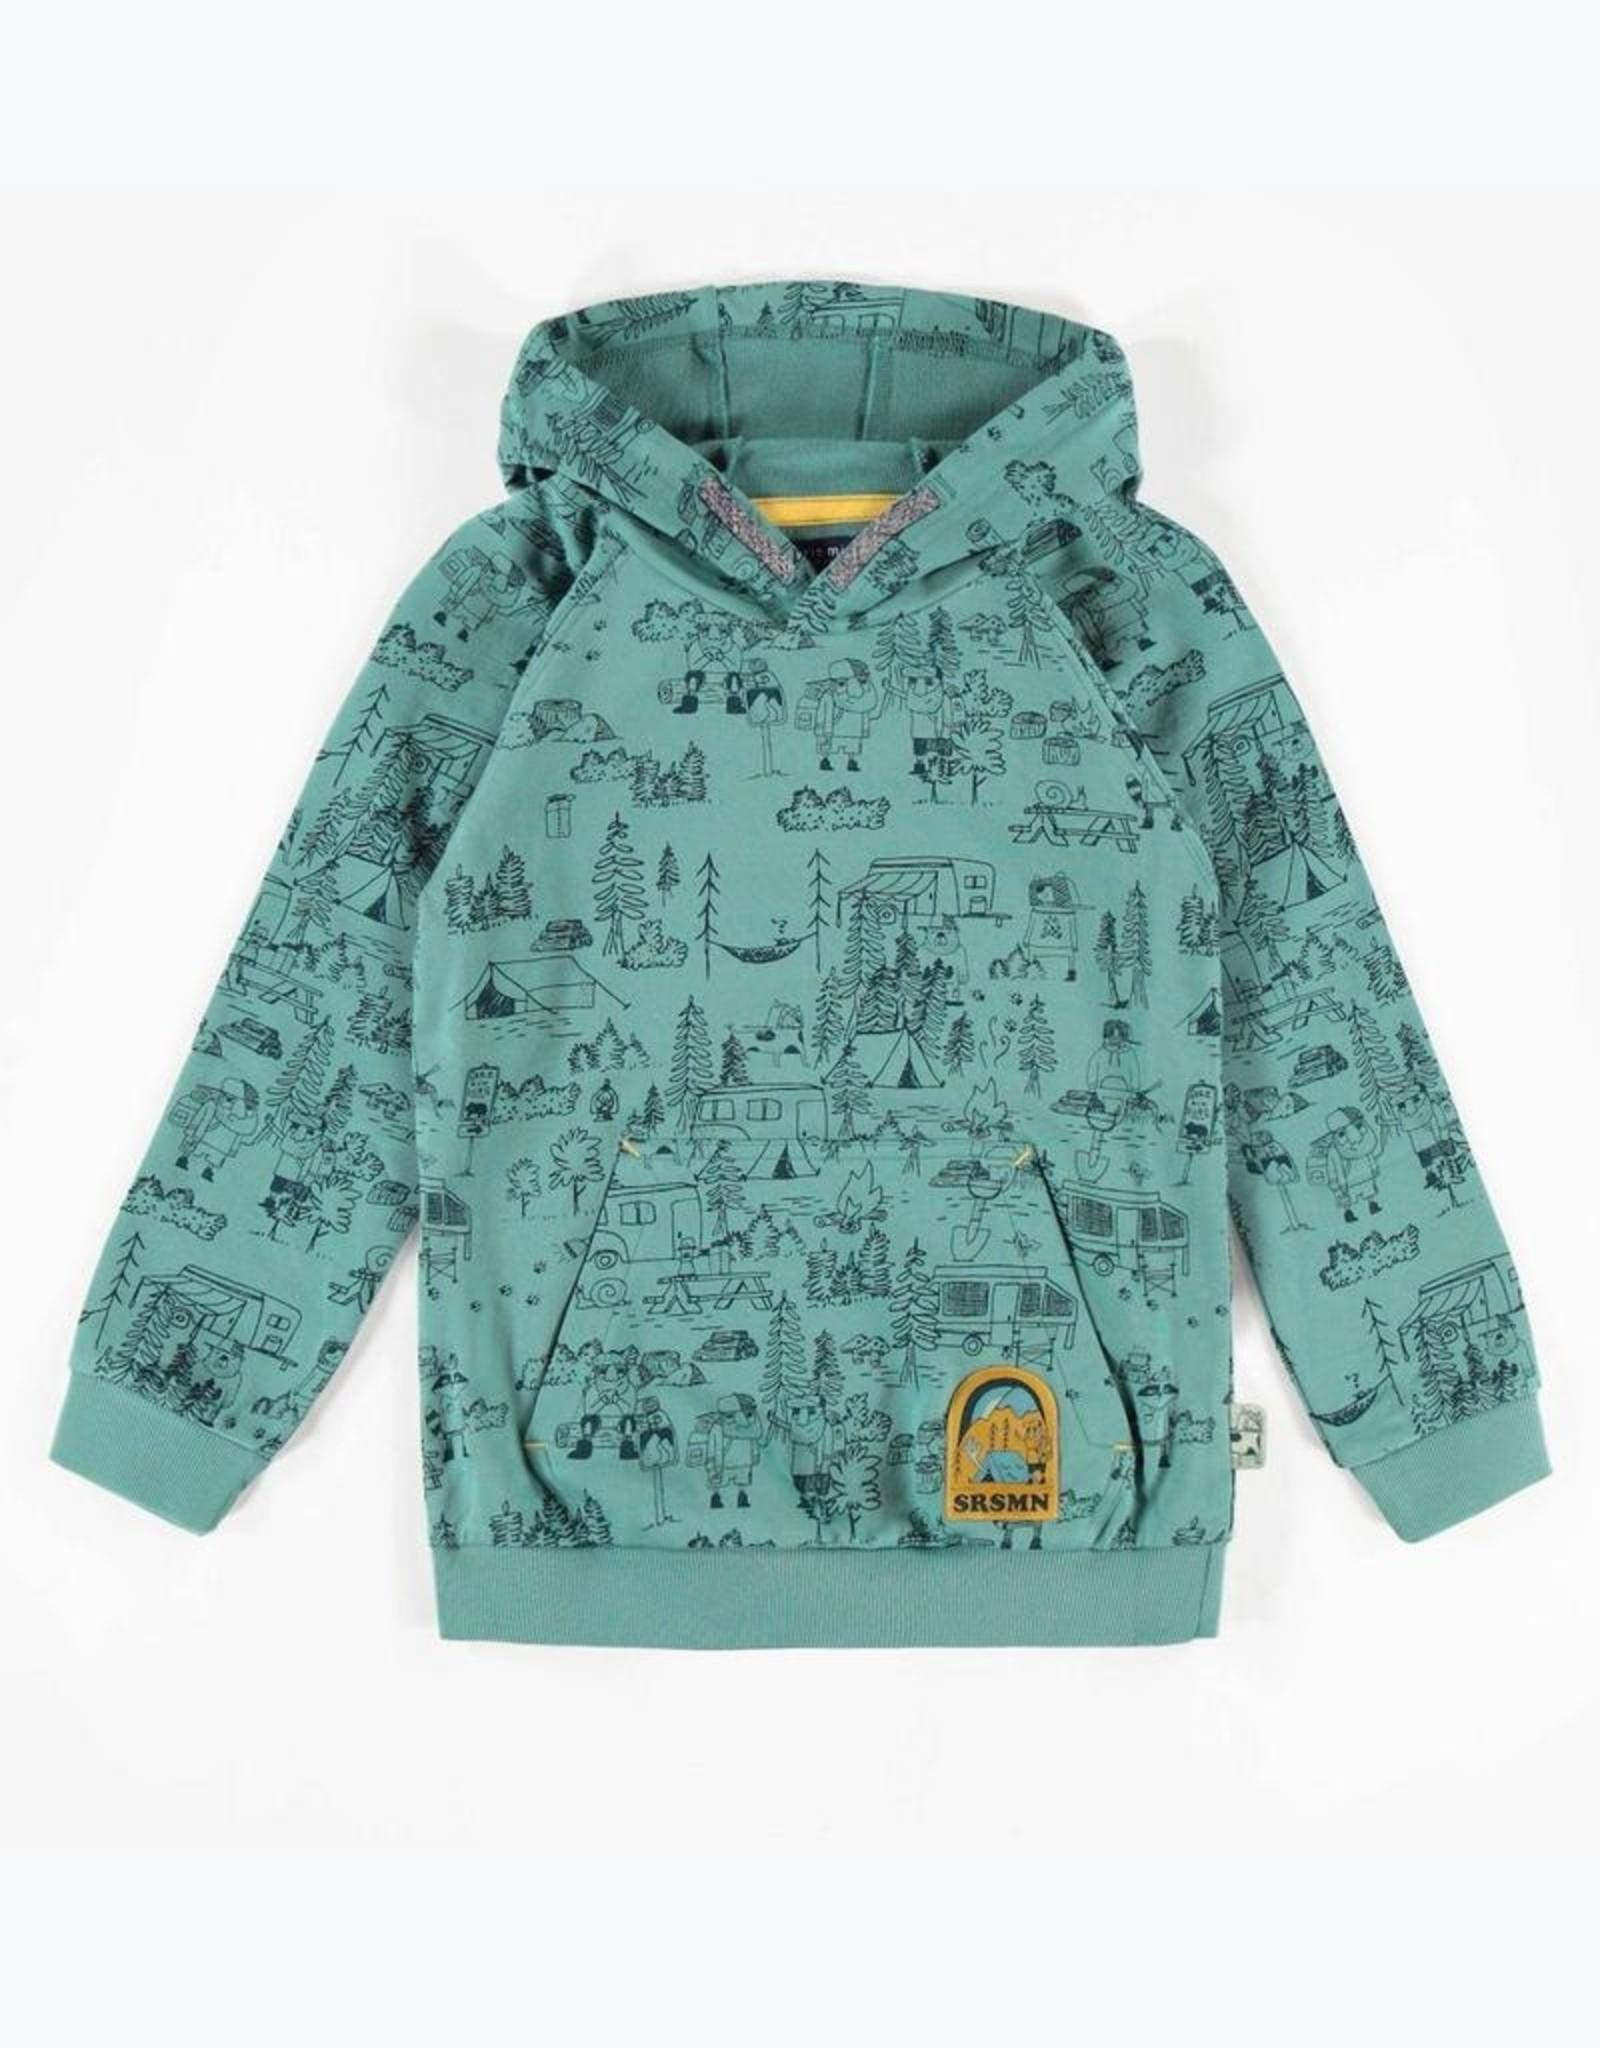 Souris Mini Green Outdoor Print Hooded Sweatshirt